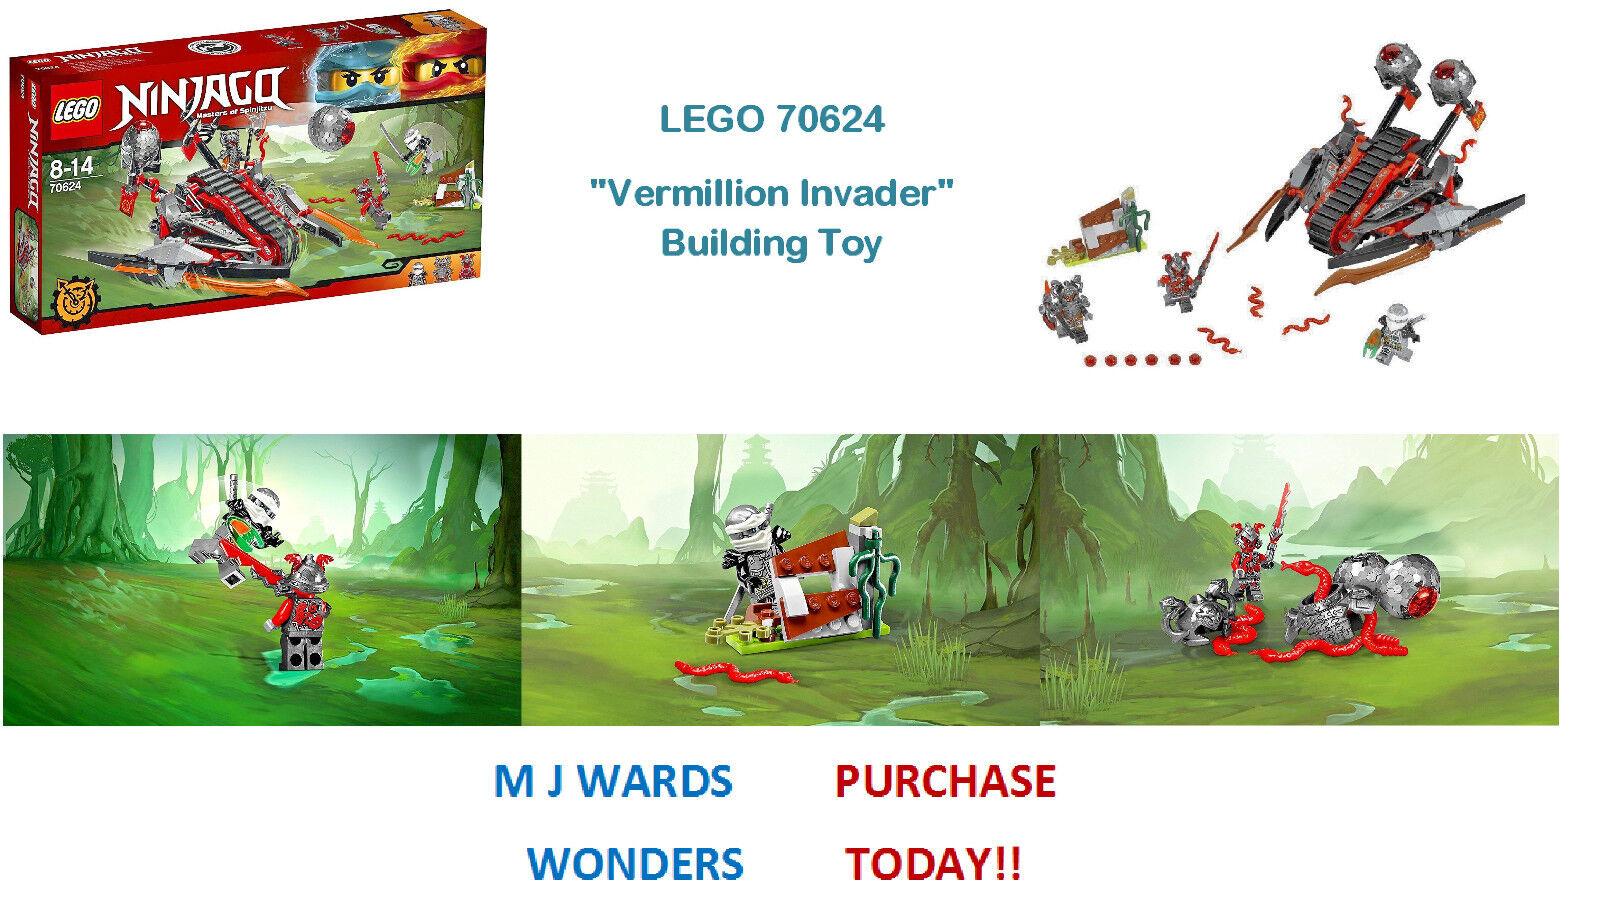 LEGO 70624  Vermillion Invader  Building Toy